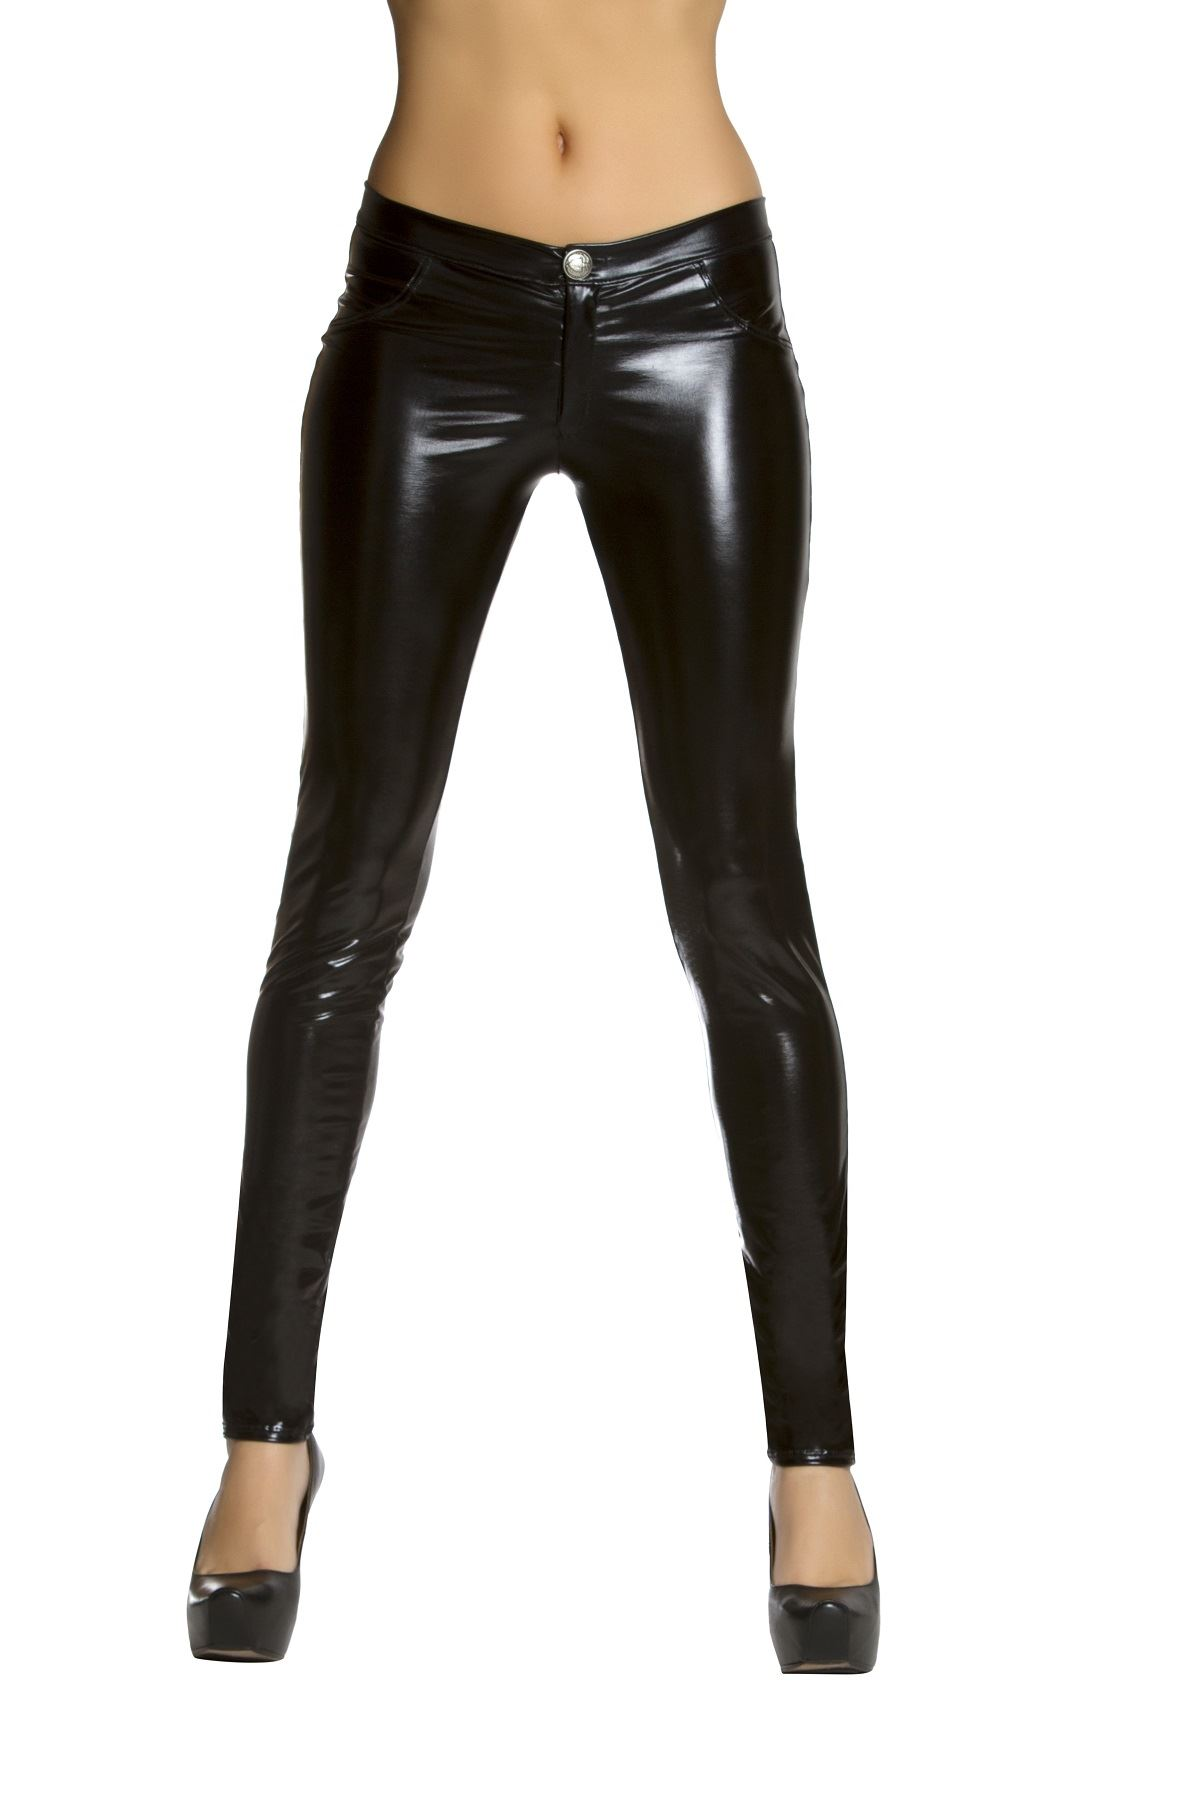 Black Metallic Button Front Pants with Pocket Detail | $33.99 ...